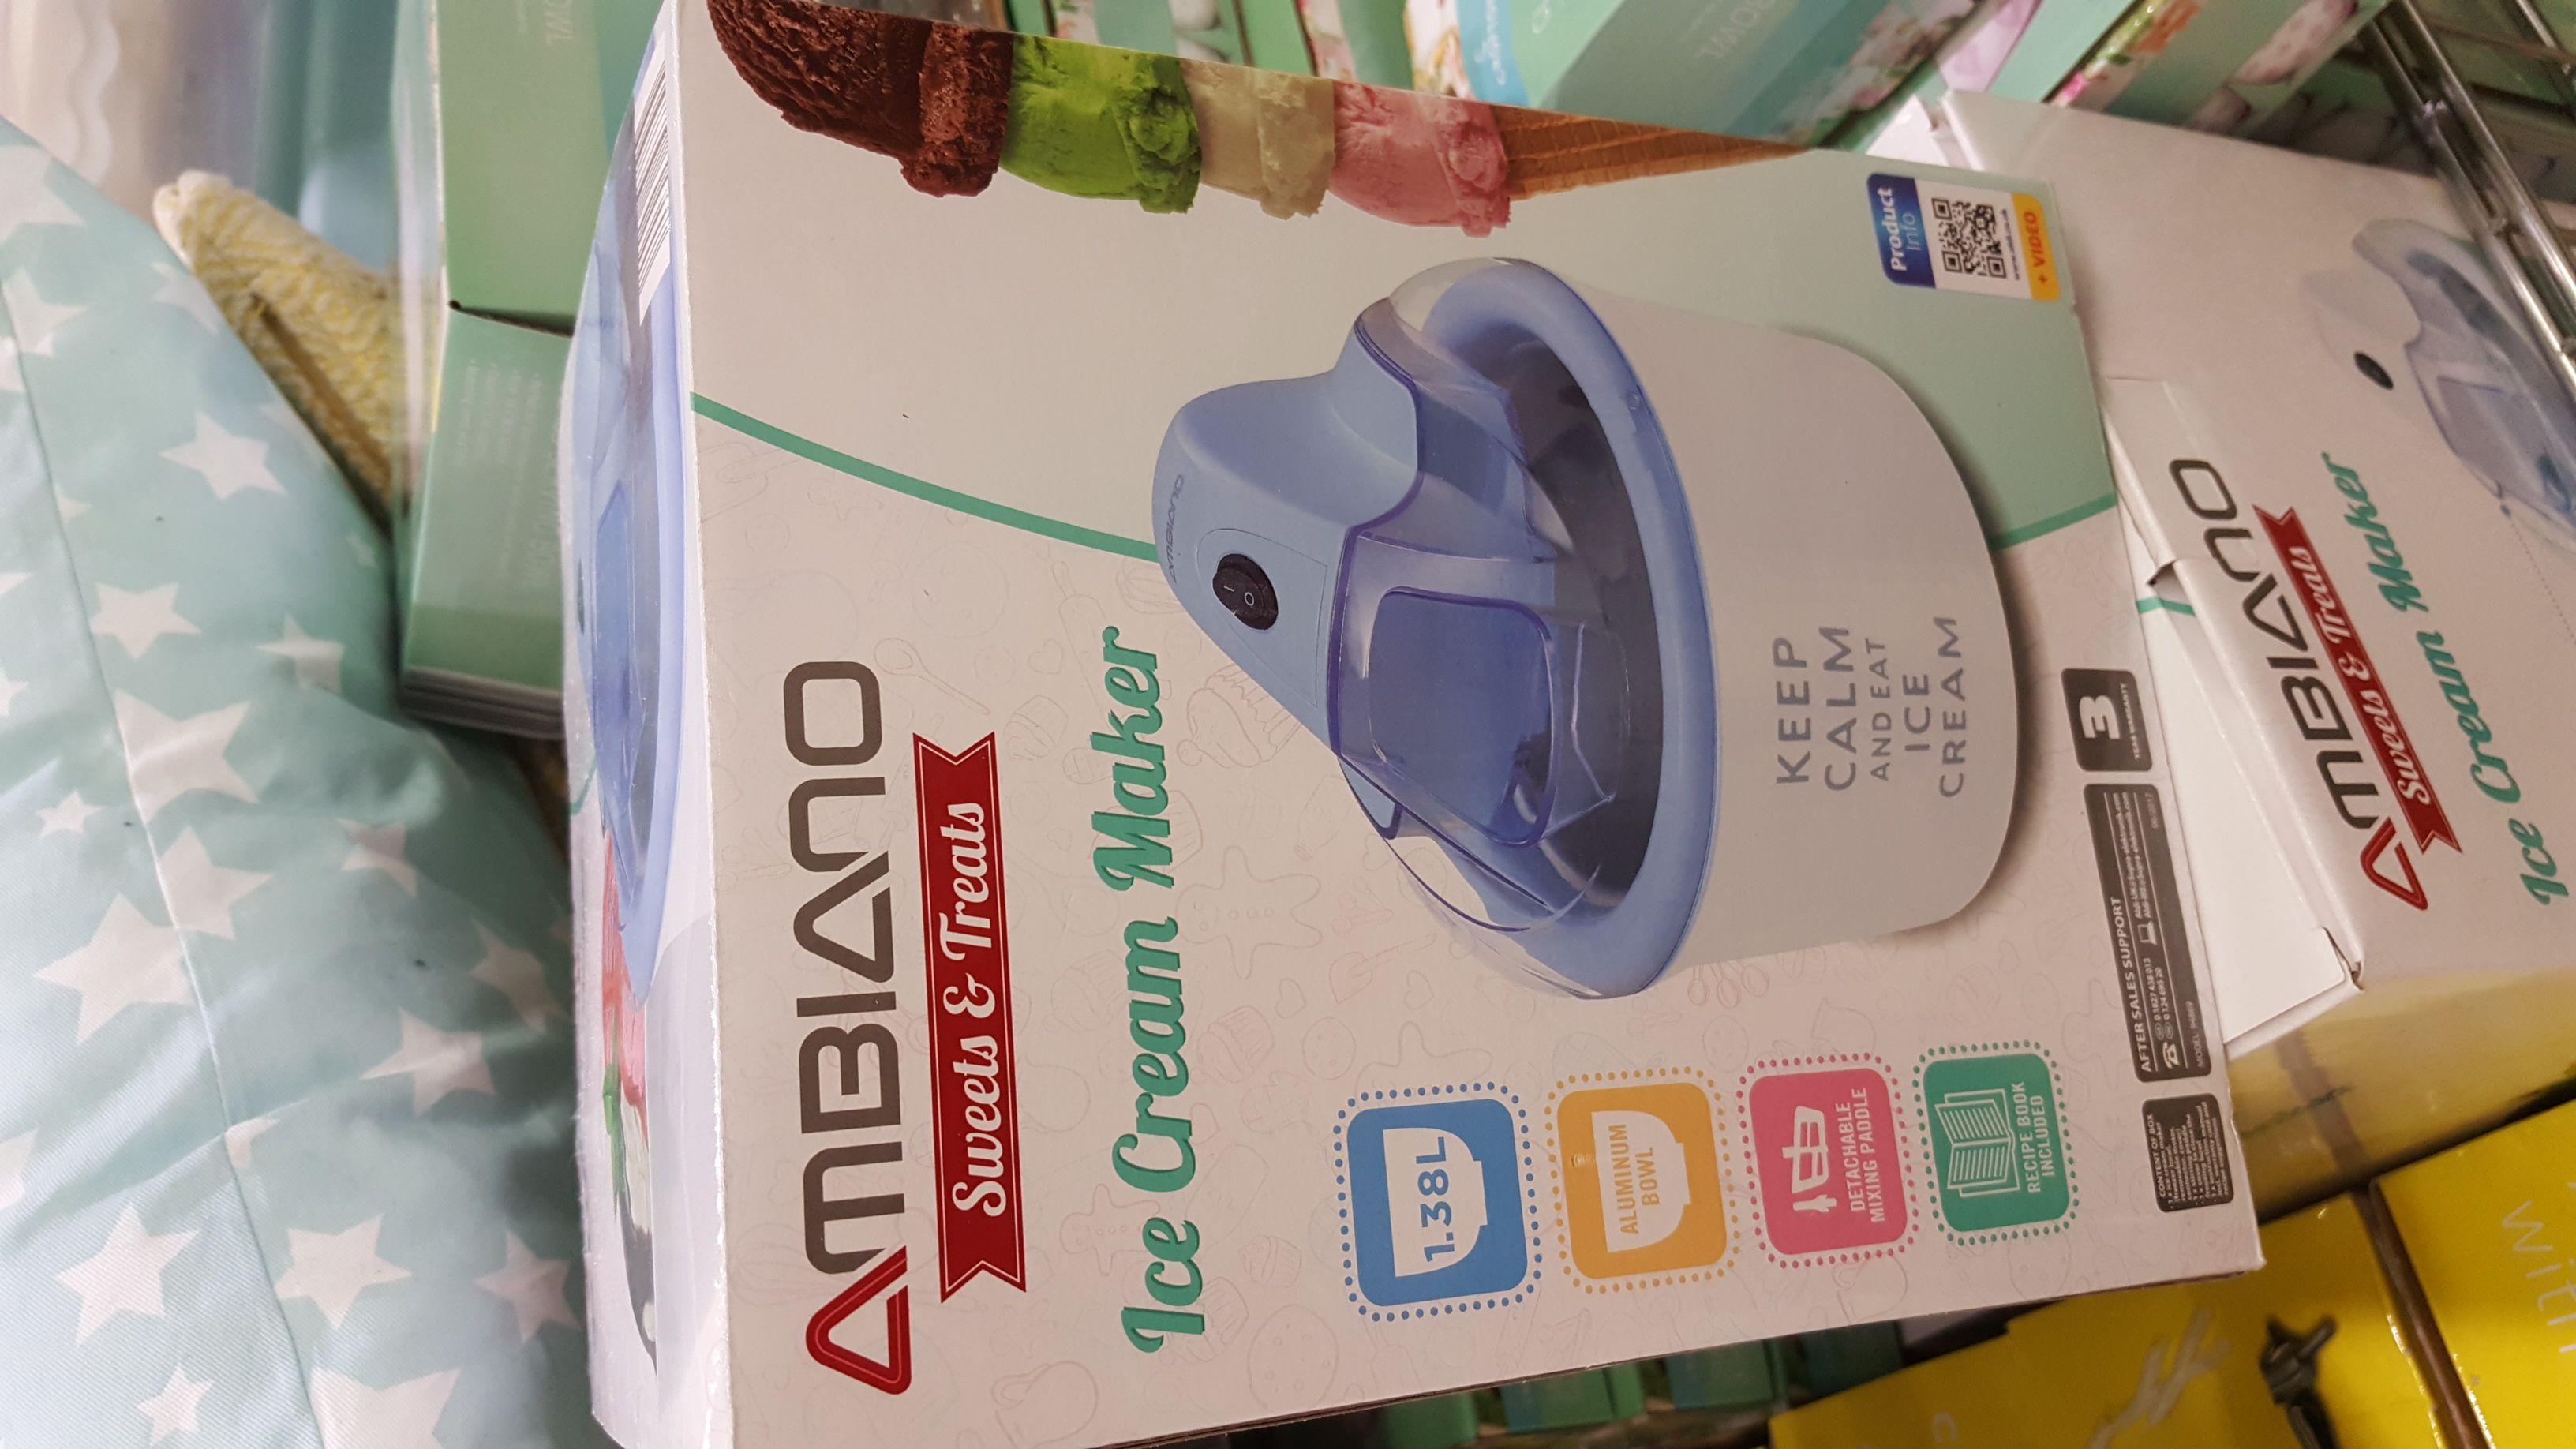 Ambiano Ice Cream Maker £14.99 @ Aldi yarm